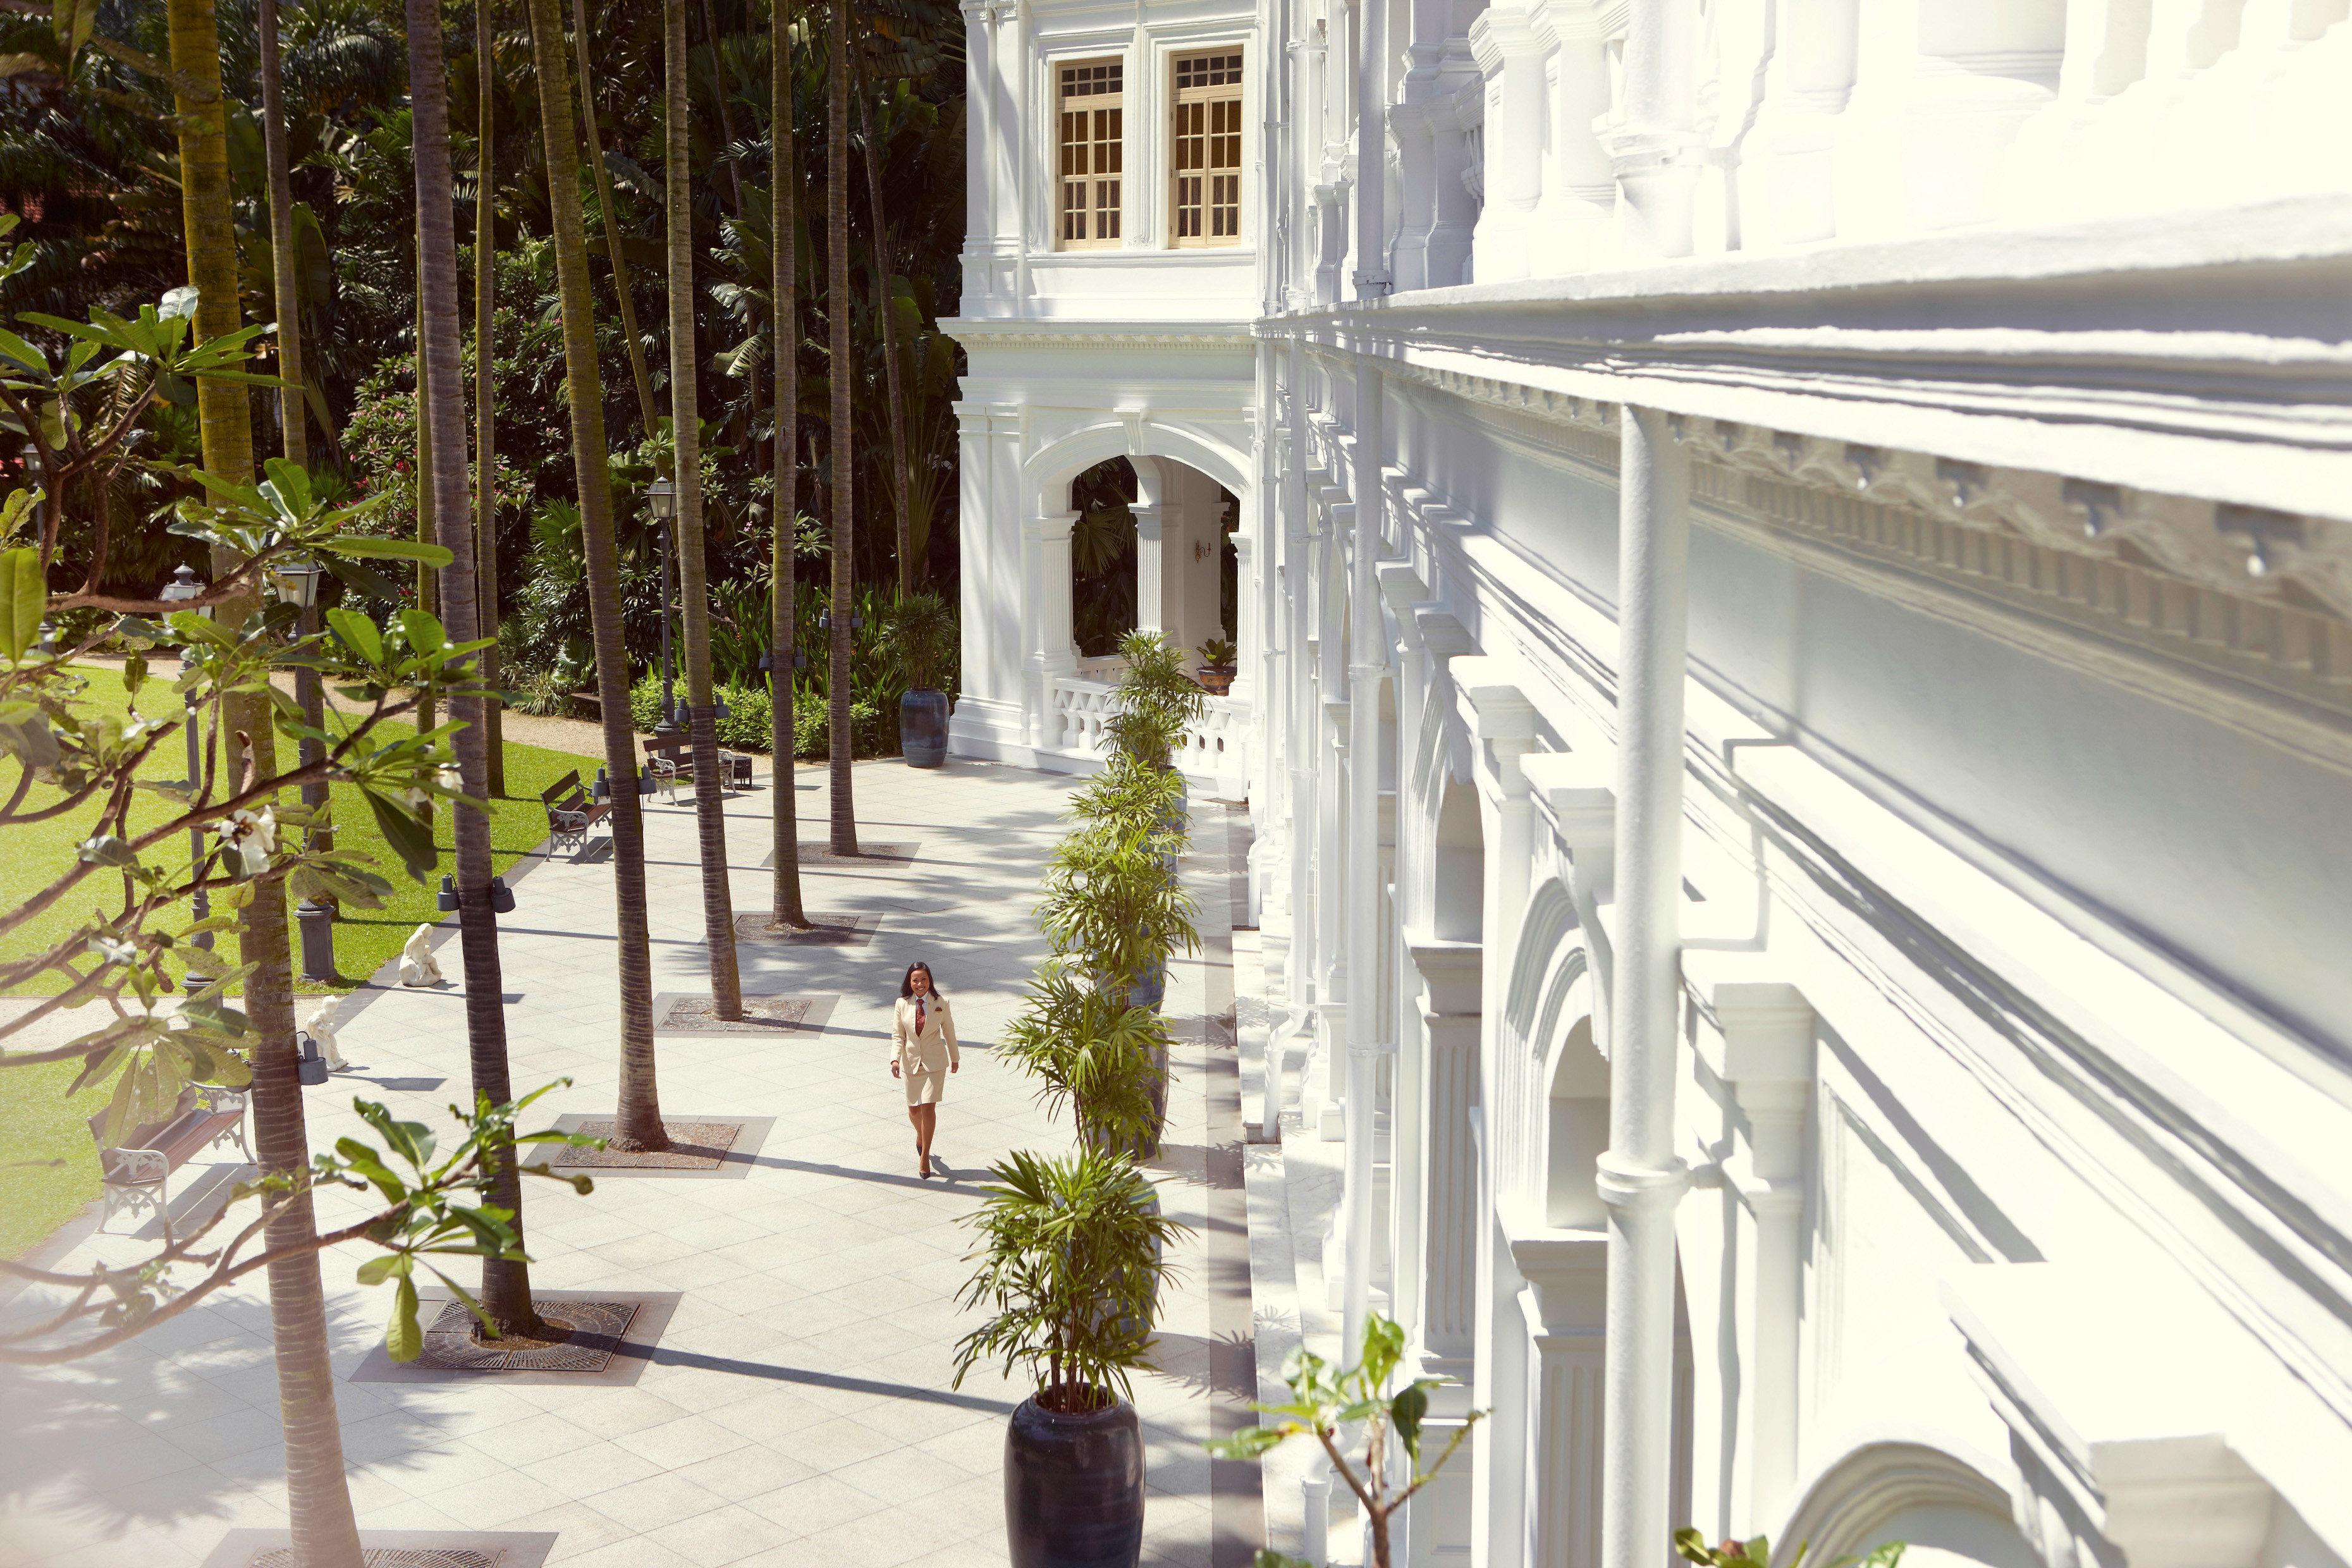 Architecture Buildings Exterior Historic Hotels property building house home Courtyard mansion condominium plant handrail porch